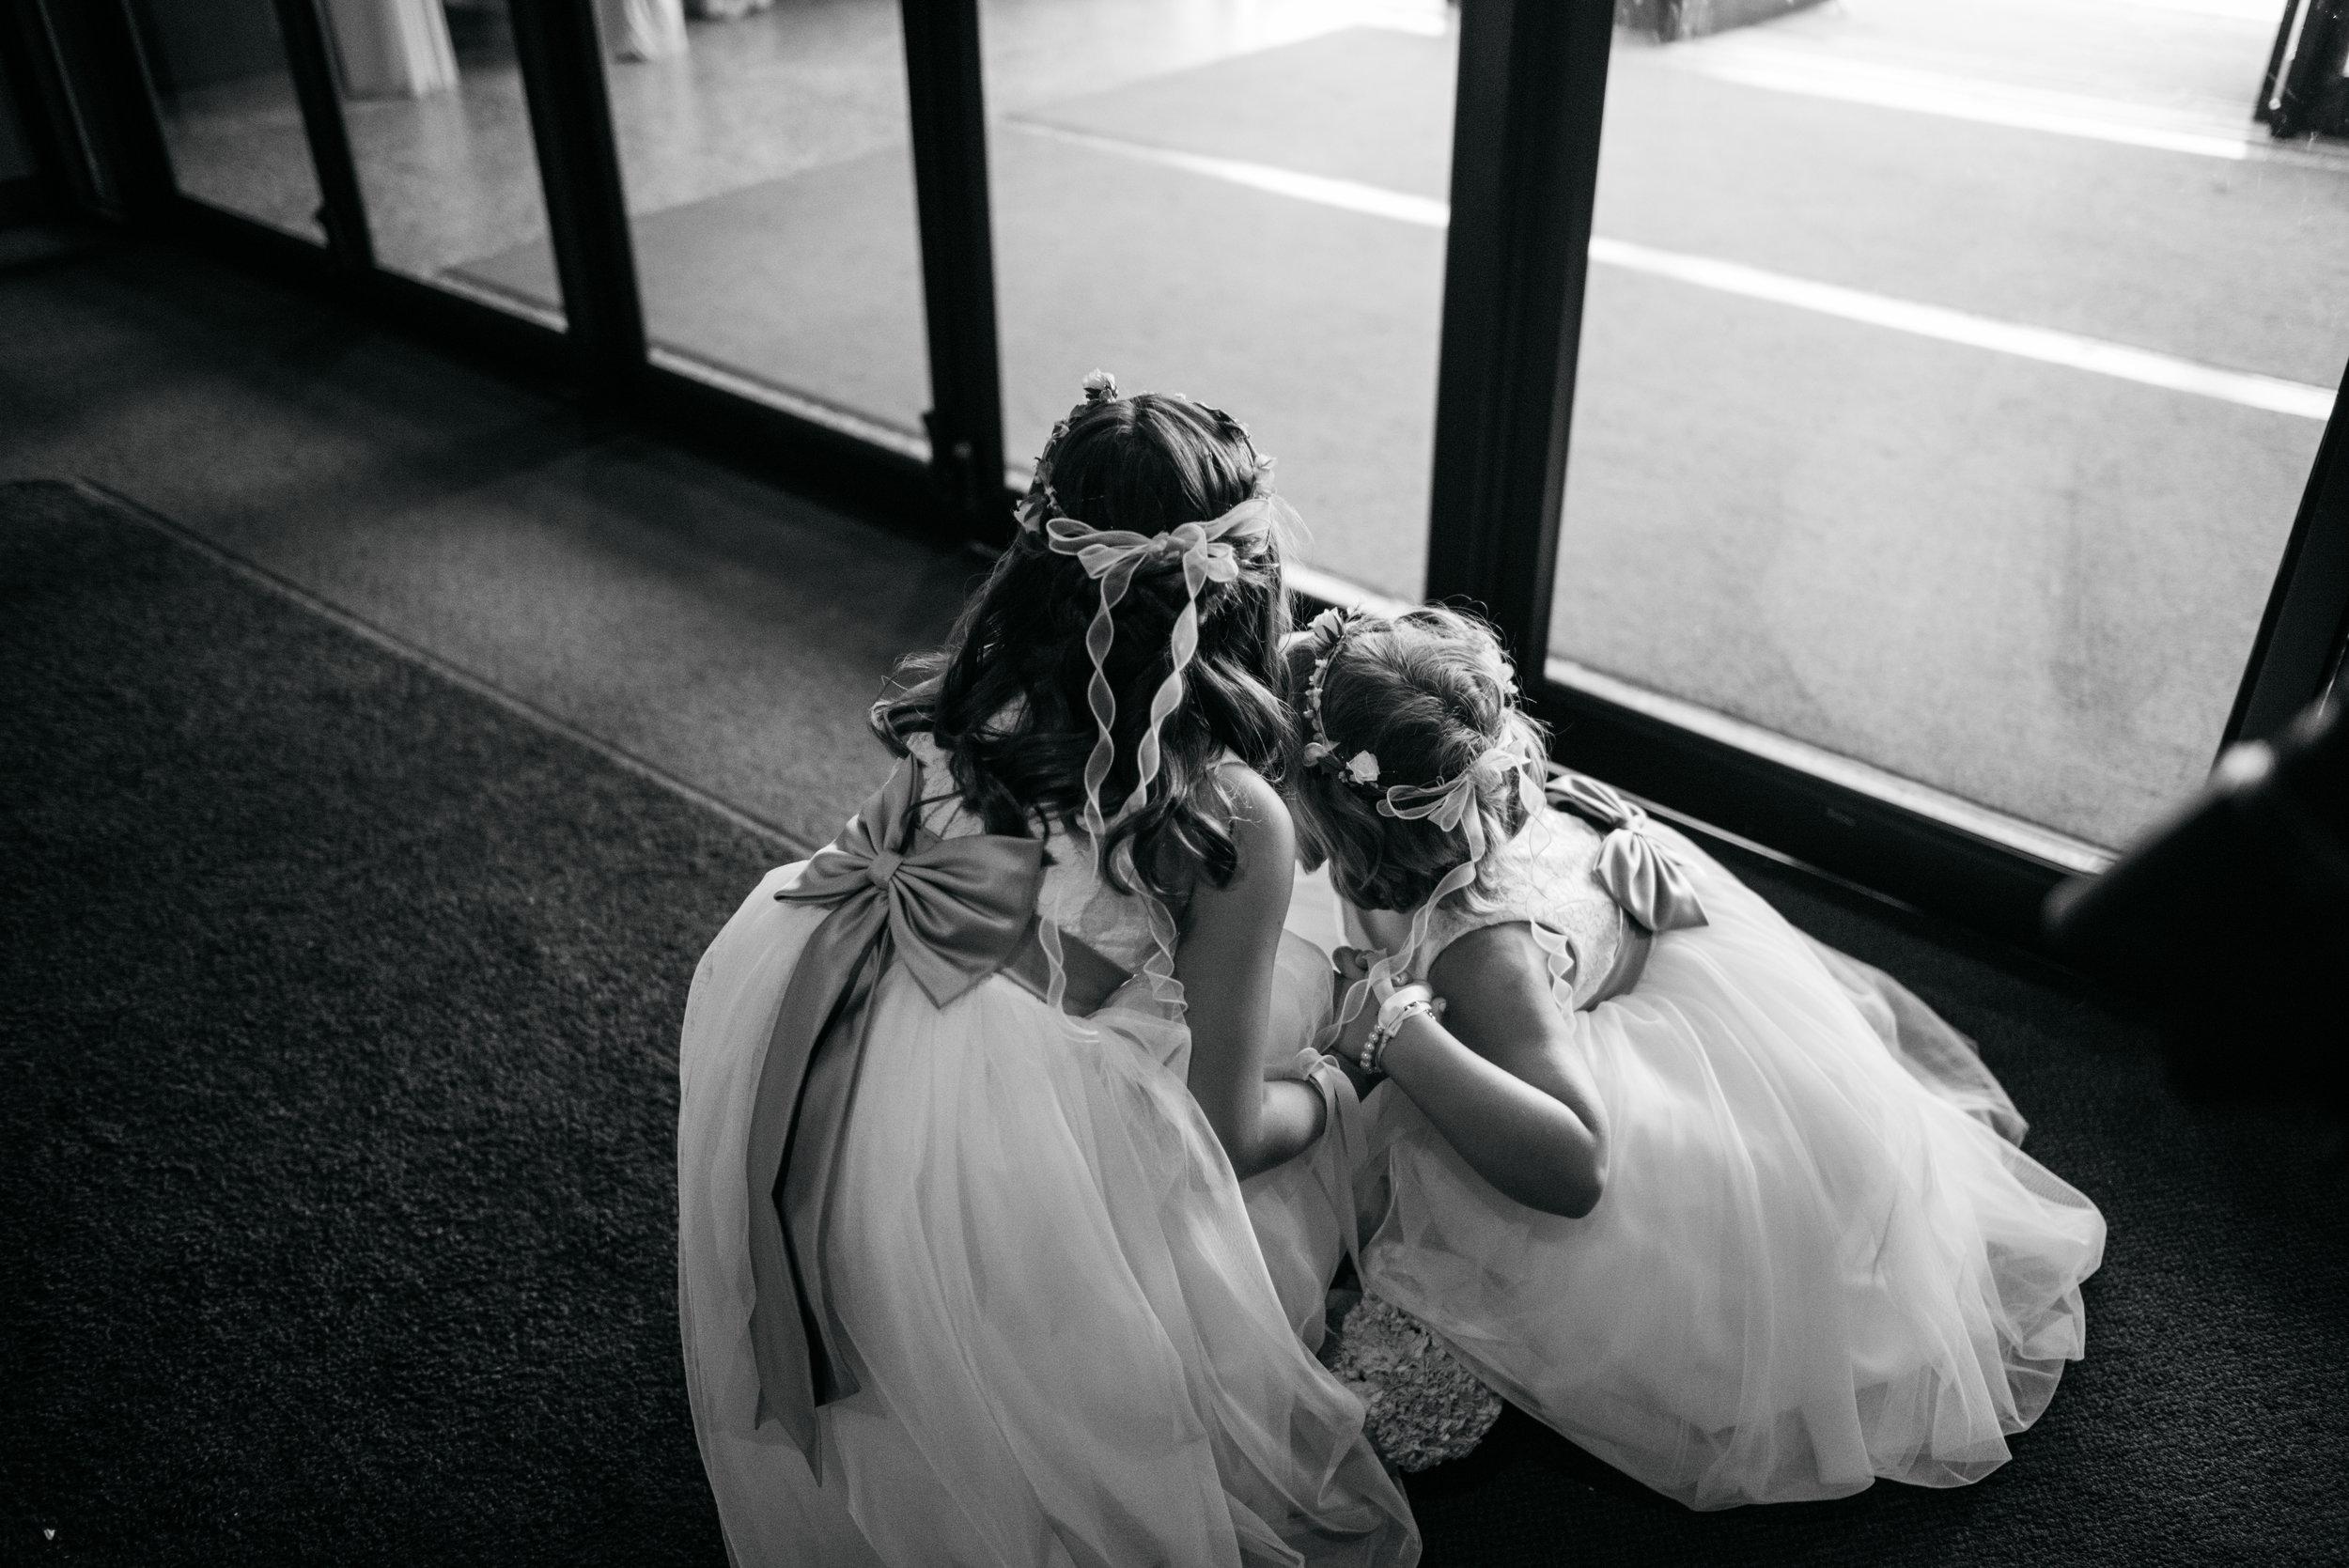 WeddingPhotos | NJPhotographer | Highlights-5-19.jpg